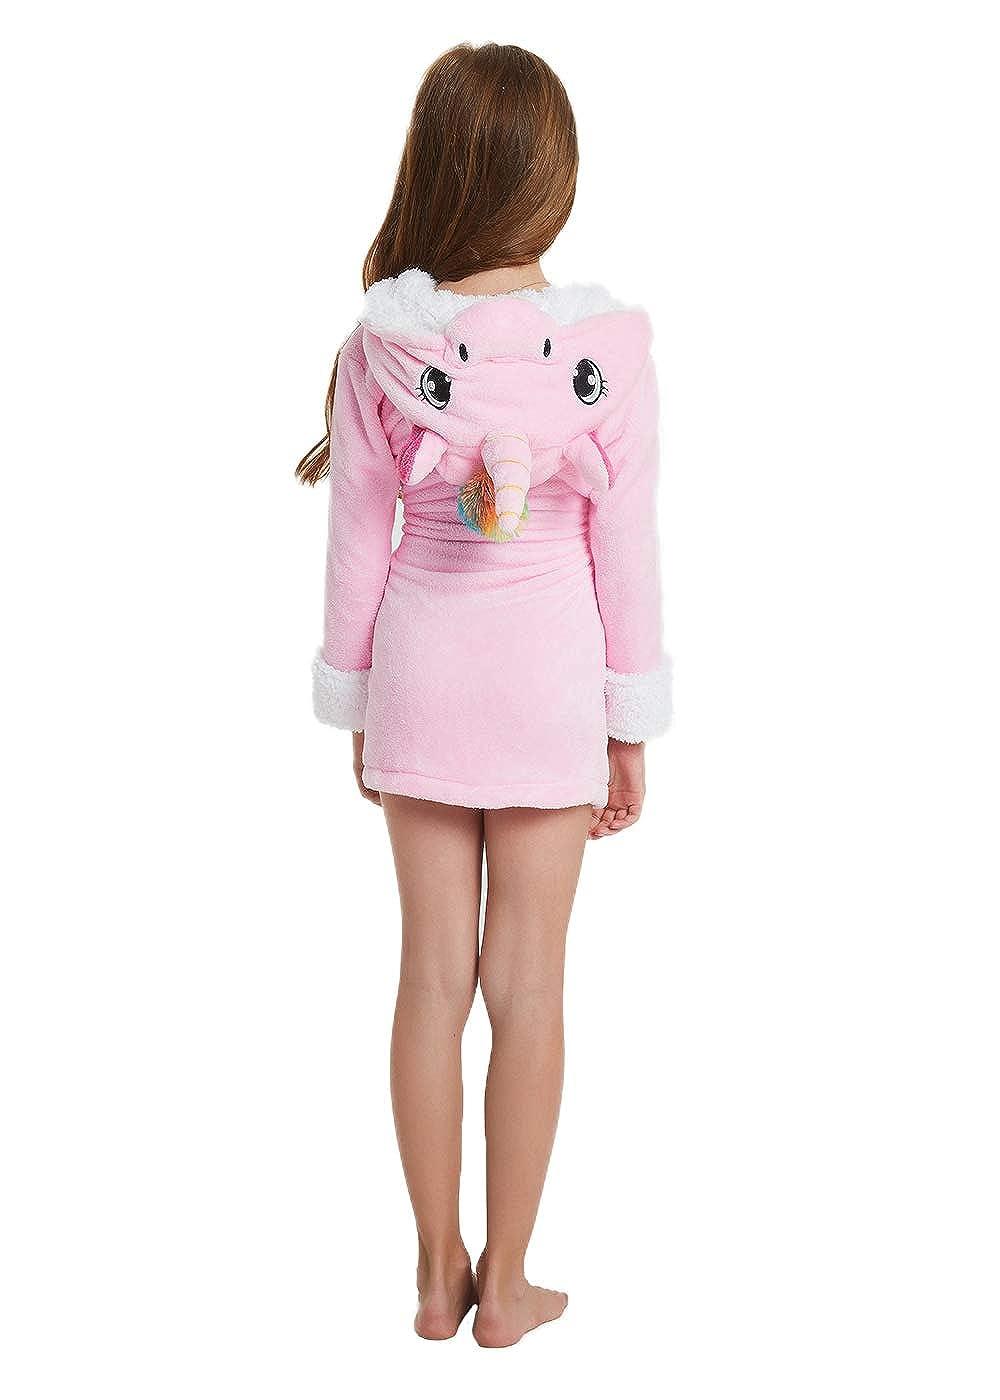 Boys Girls Robe Kids Unicorn Bathrobe Hooded Sleepwear Soft Loungewear Pajamas